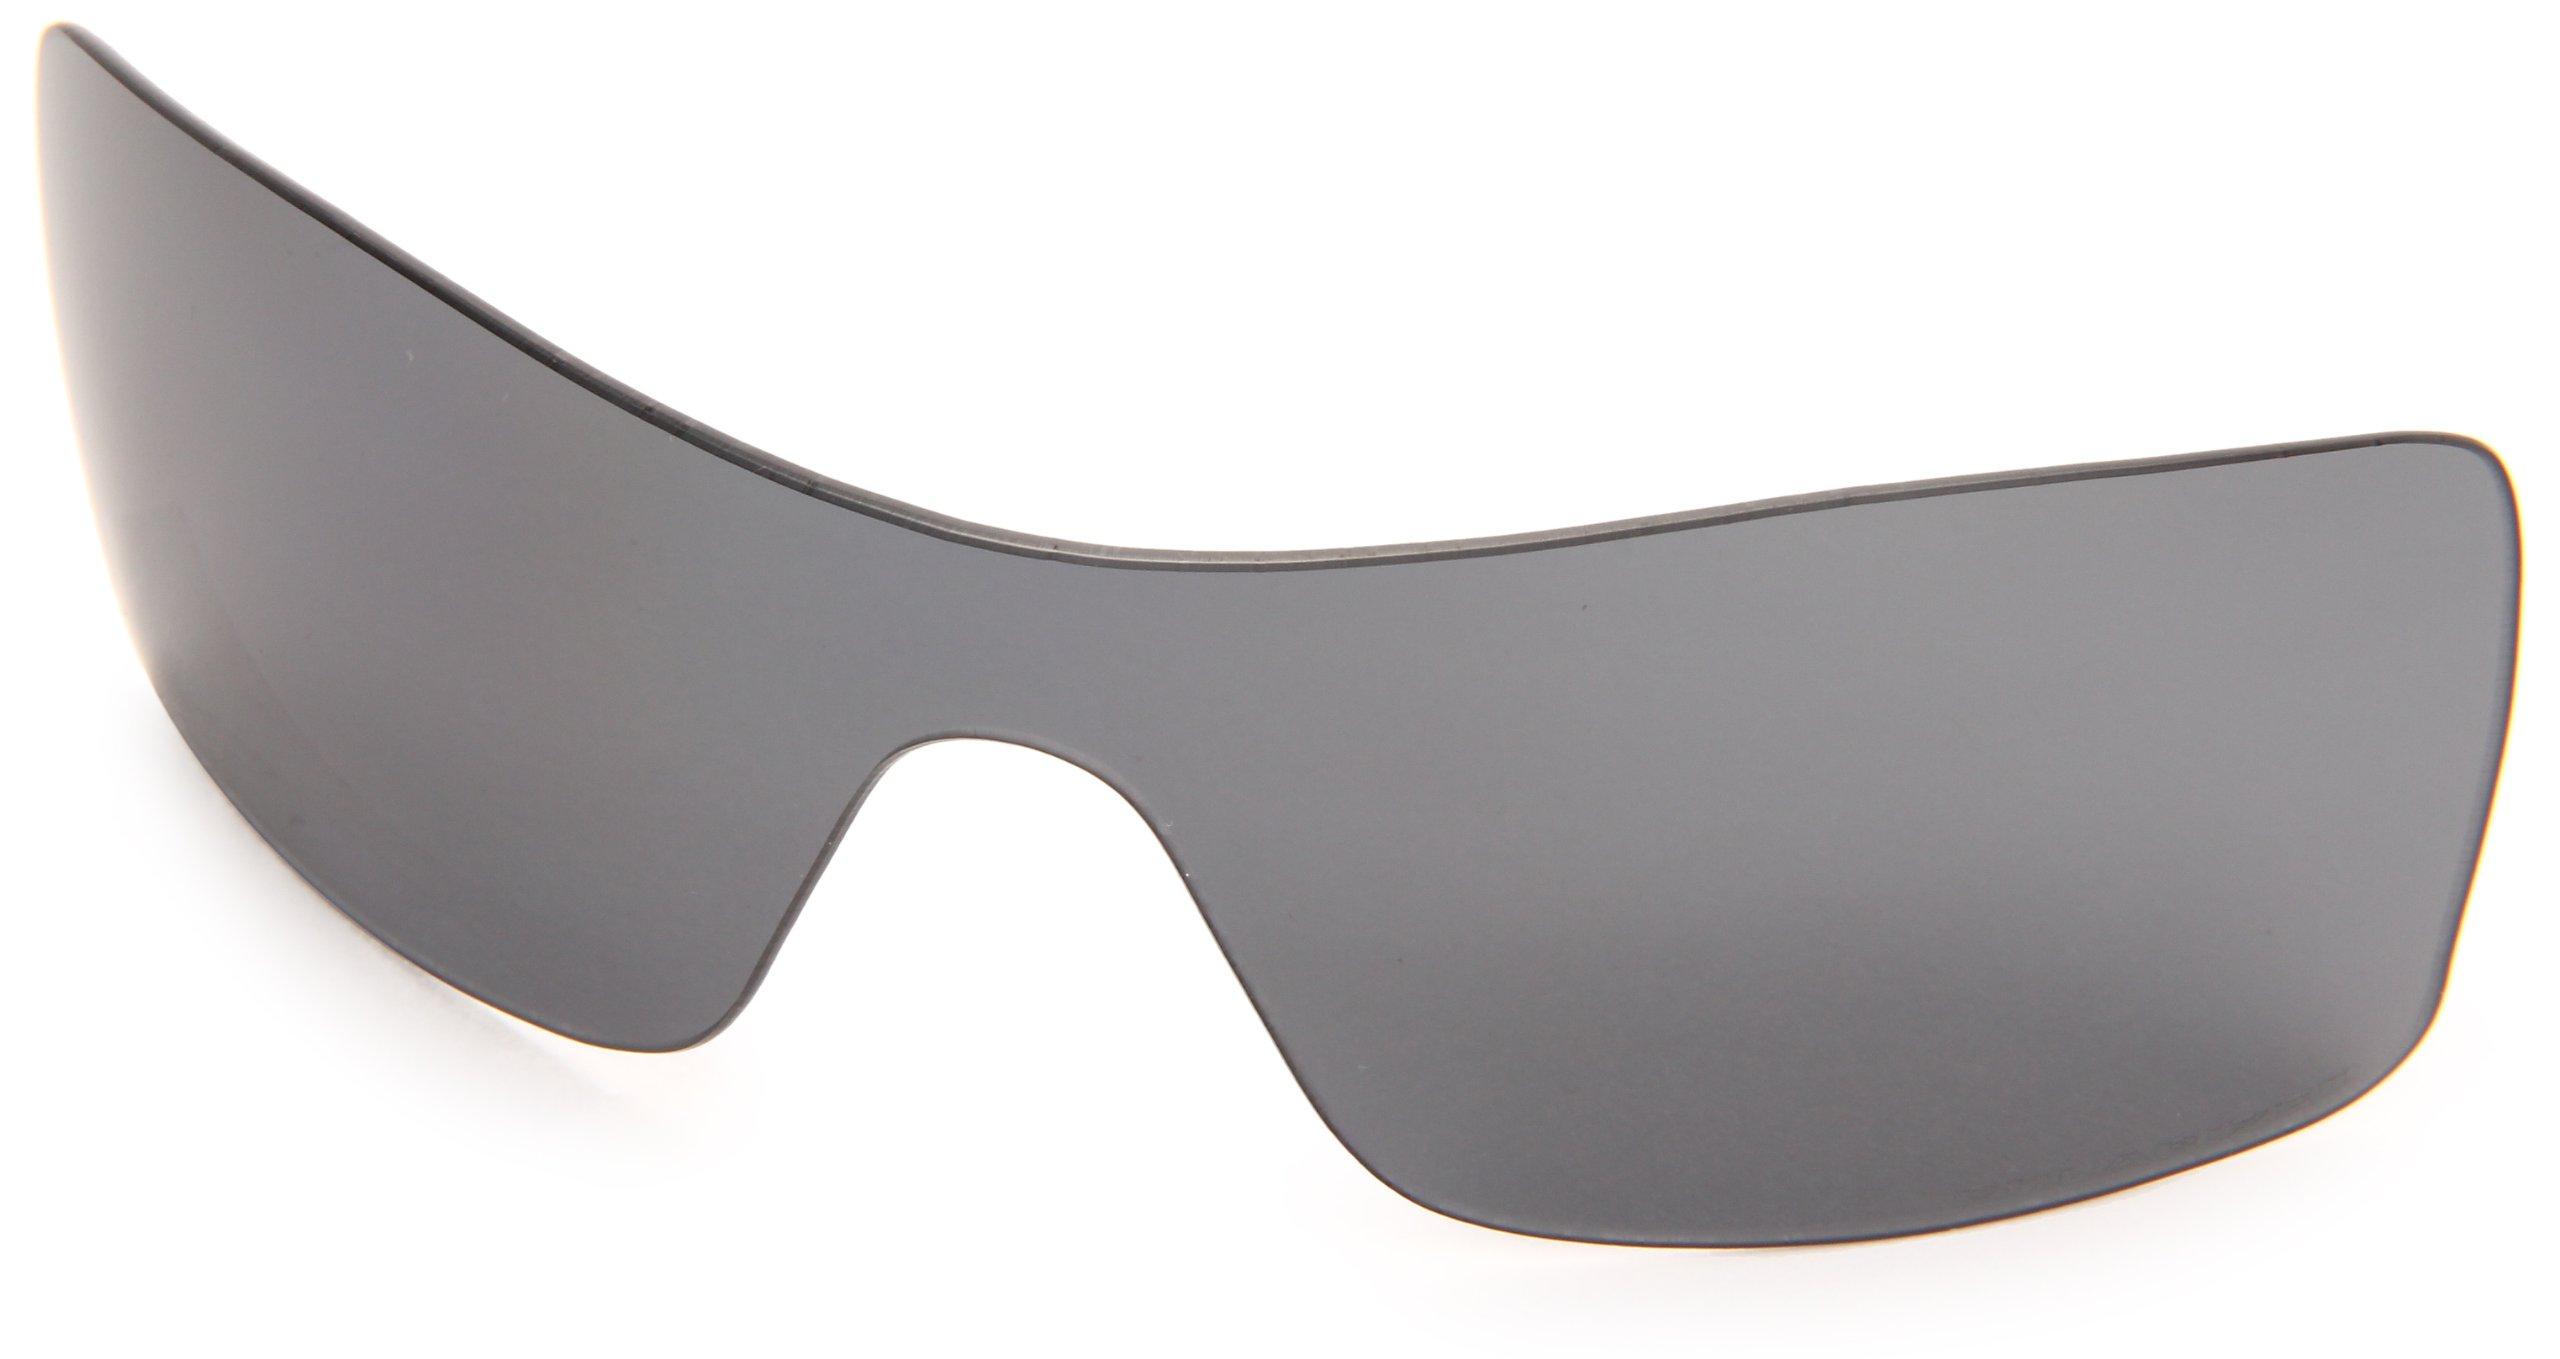 Oakley Batwolf 43-357 Polarized Replacement Lens Kit,Multi Frame/Grey Lens, 127mm